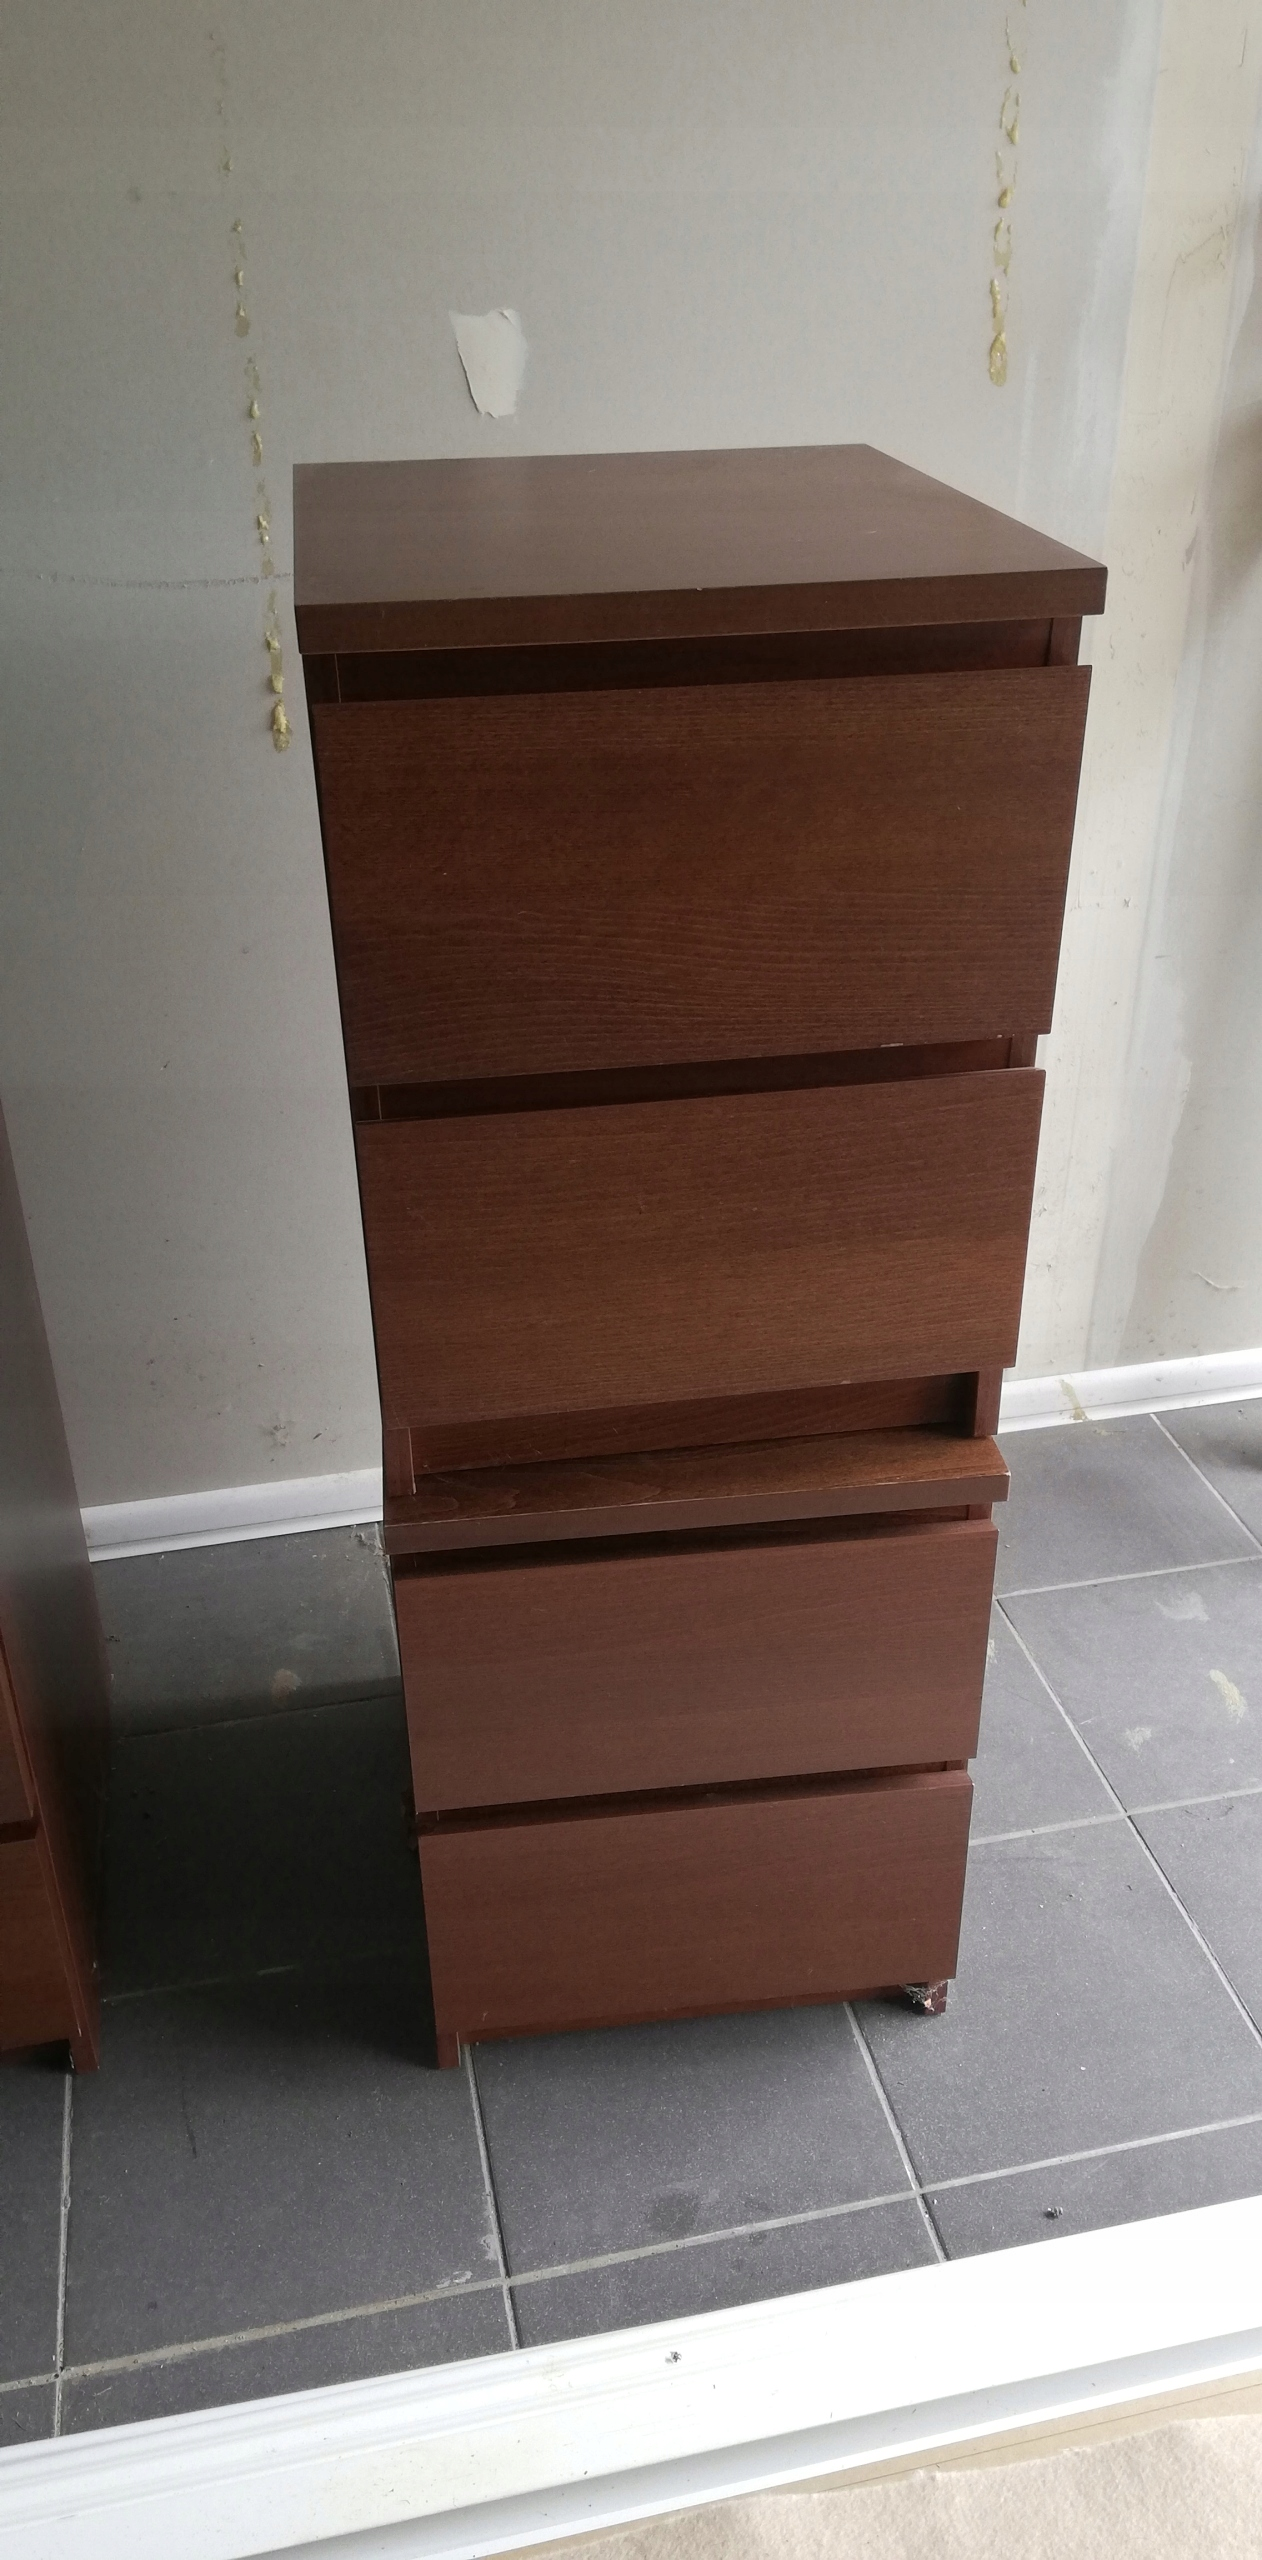 Komoda Stoliki Nocne Ikea 7438974325 Oficjalne Archiwum